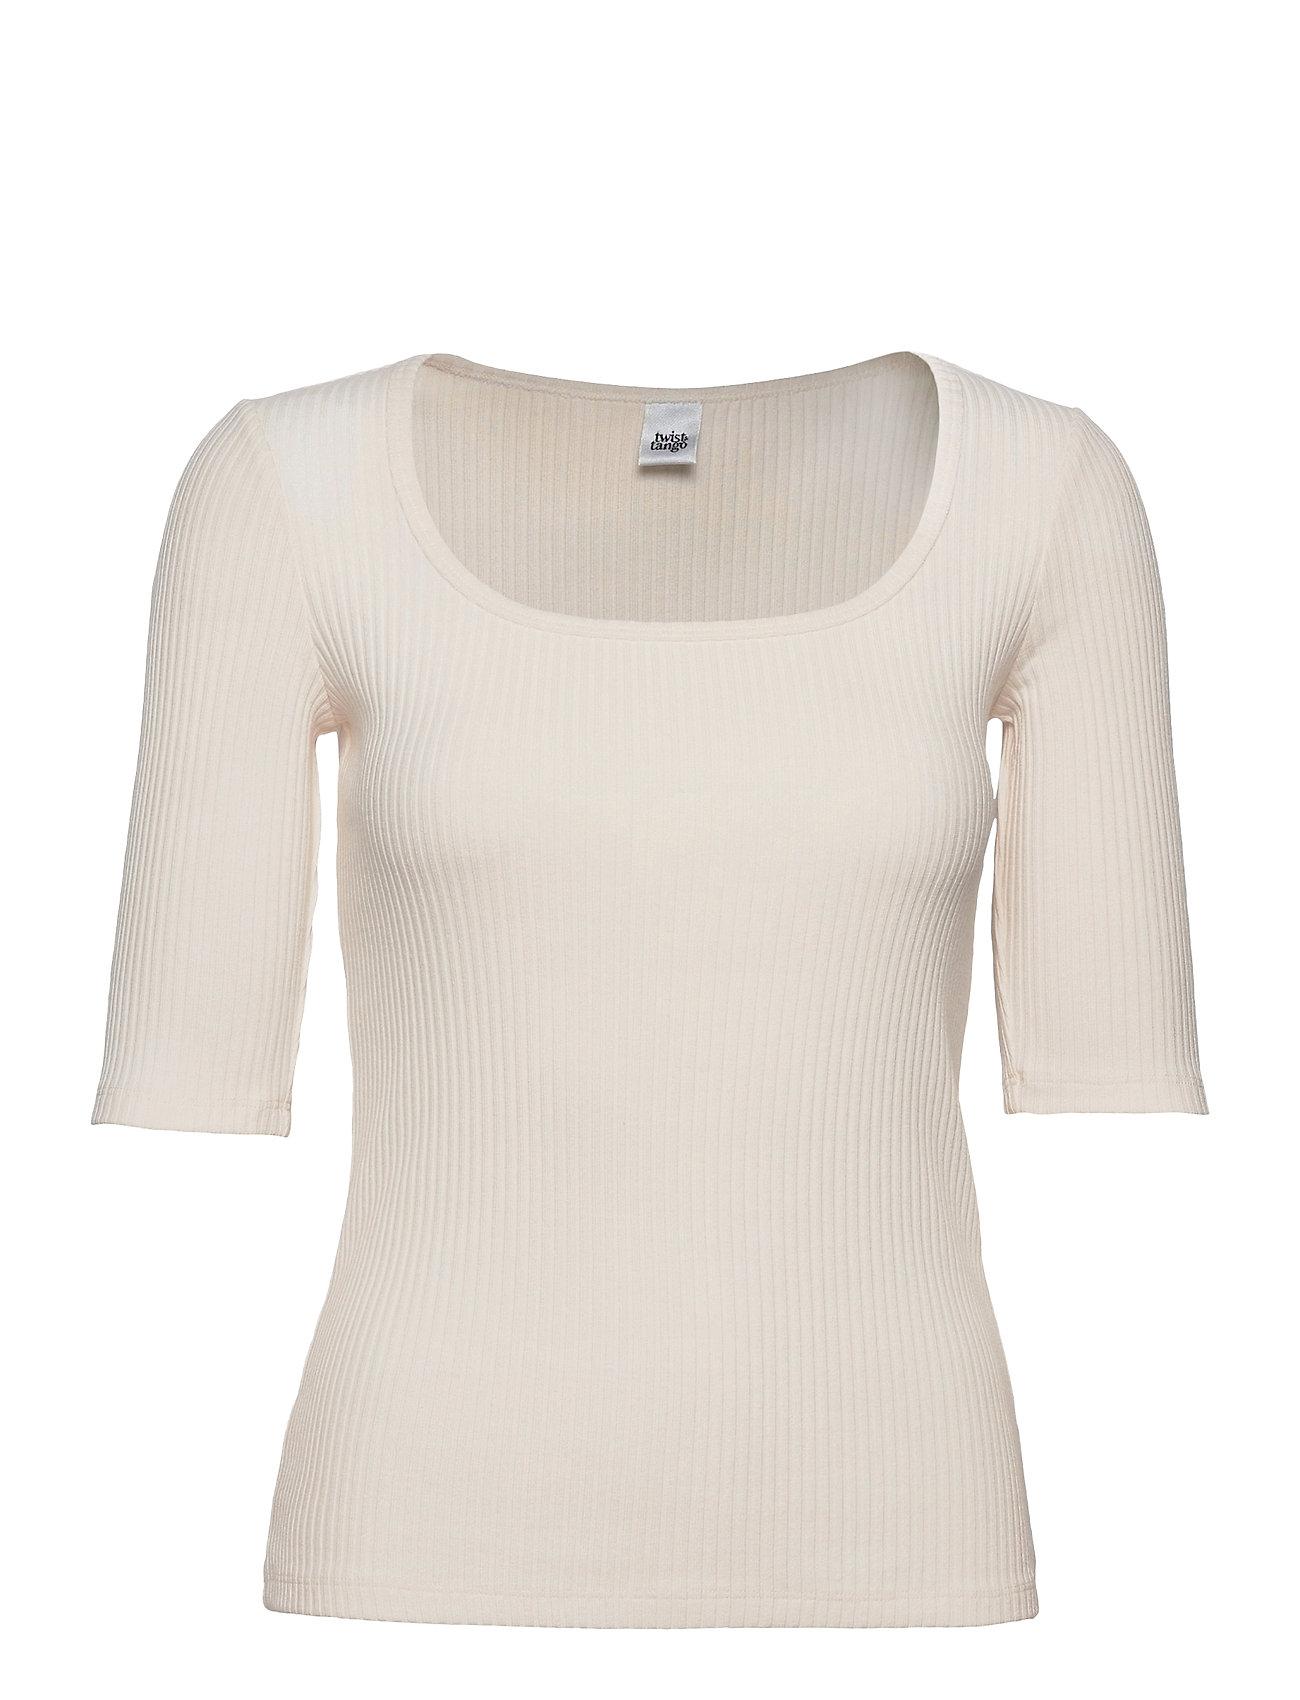 Carrie Top T-shirt Top Creme Twist & Tango